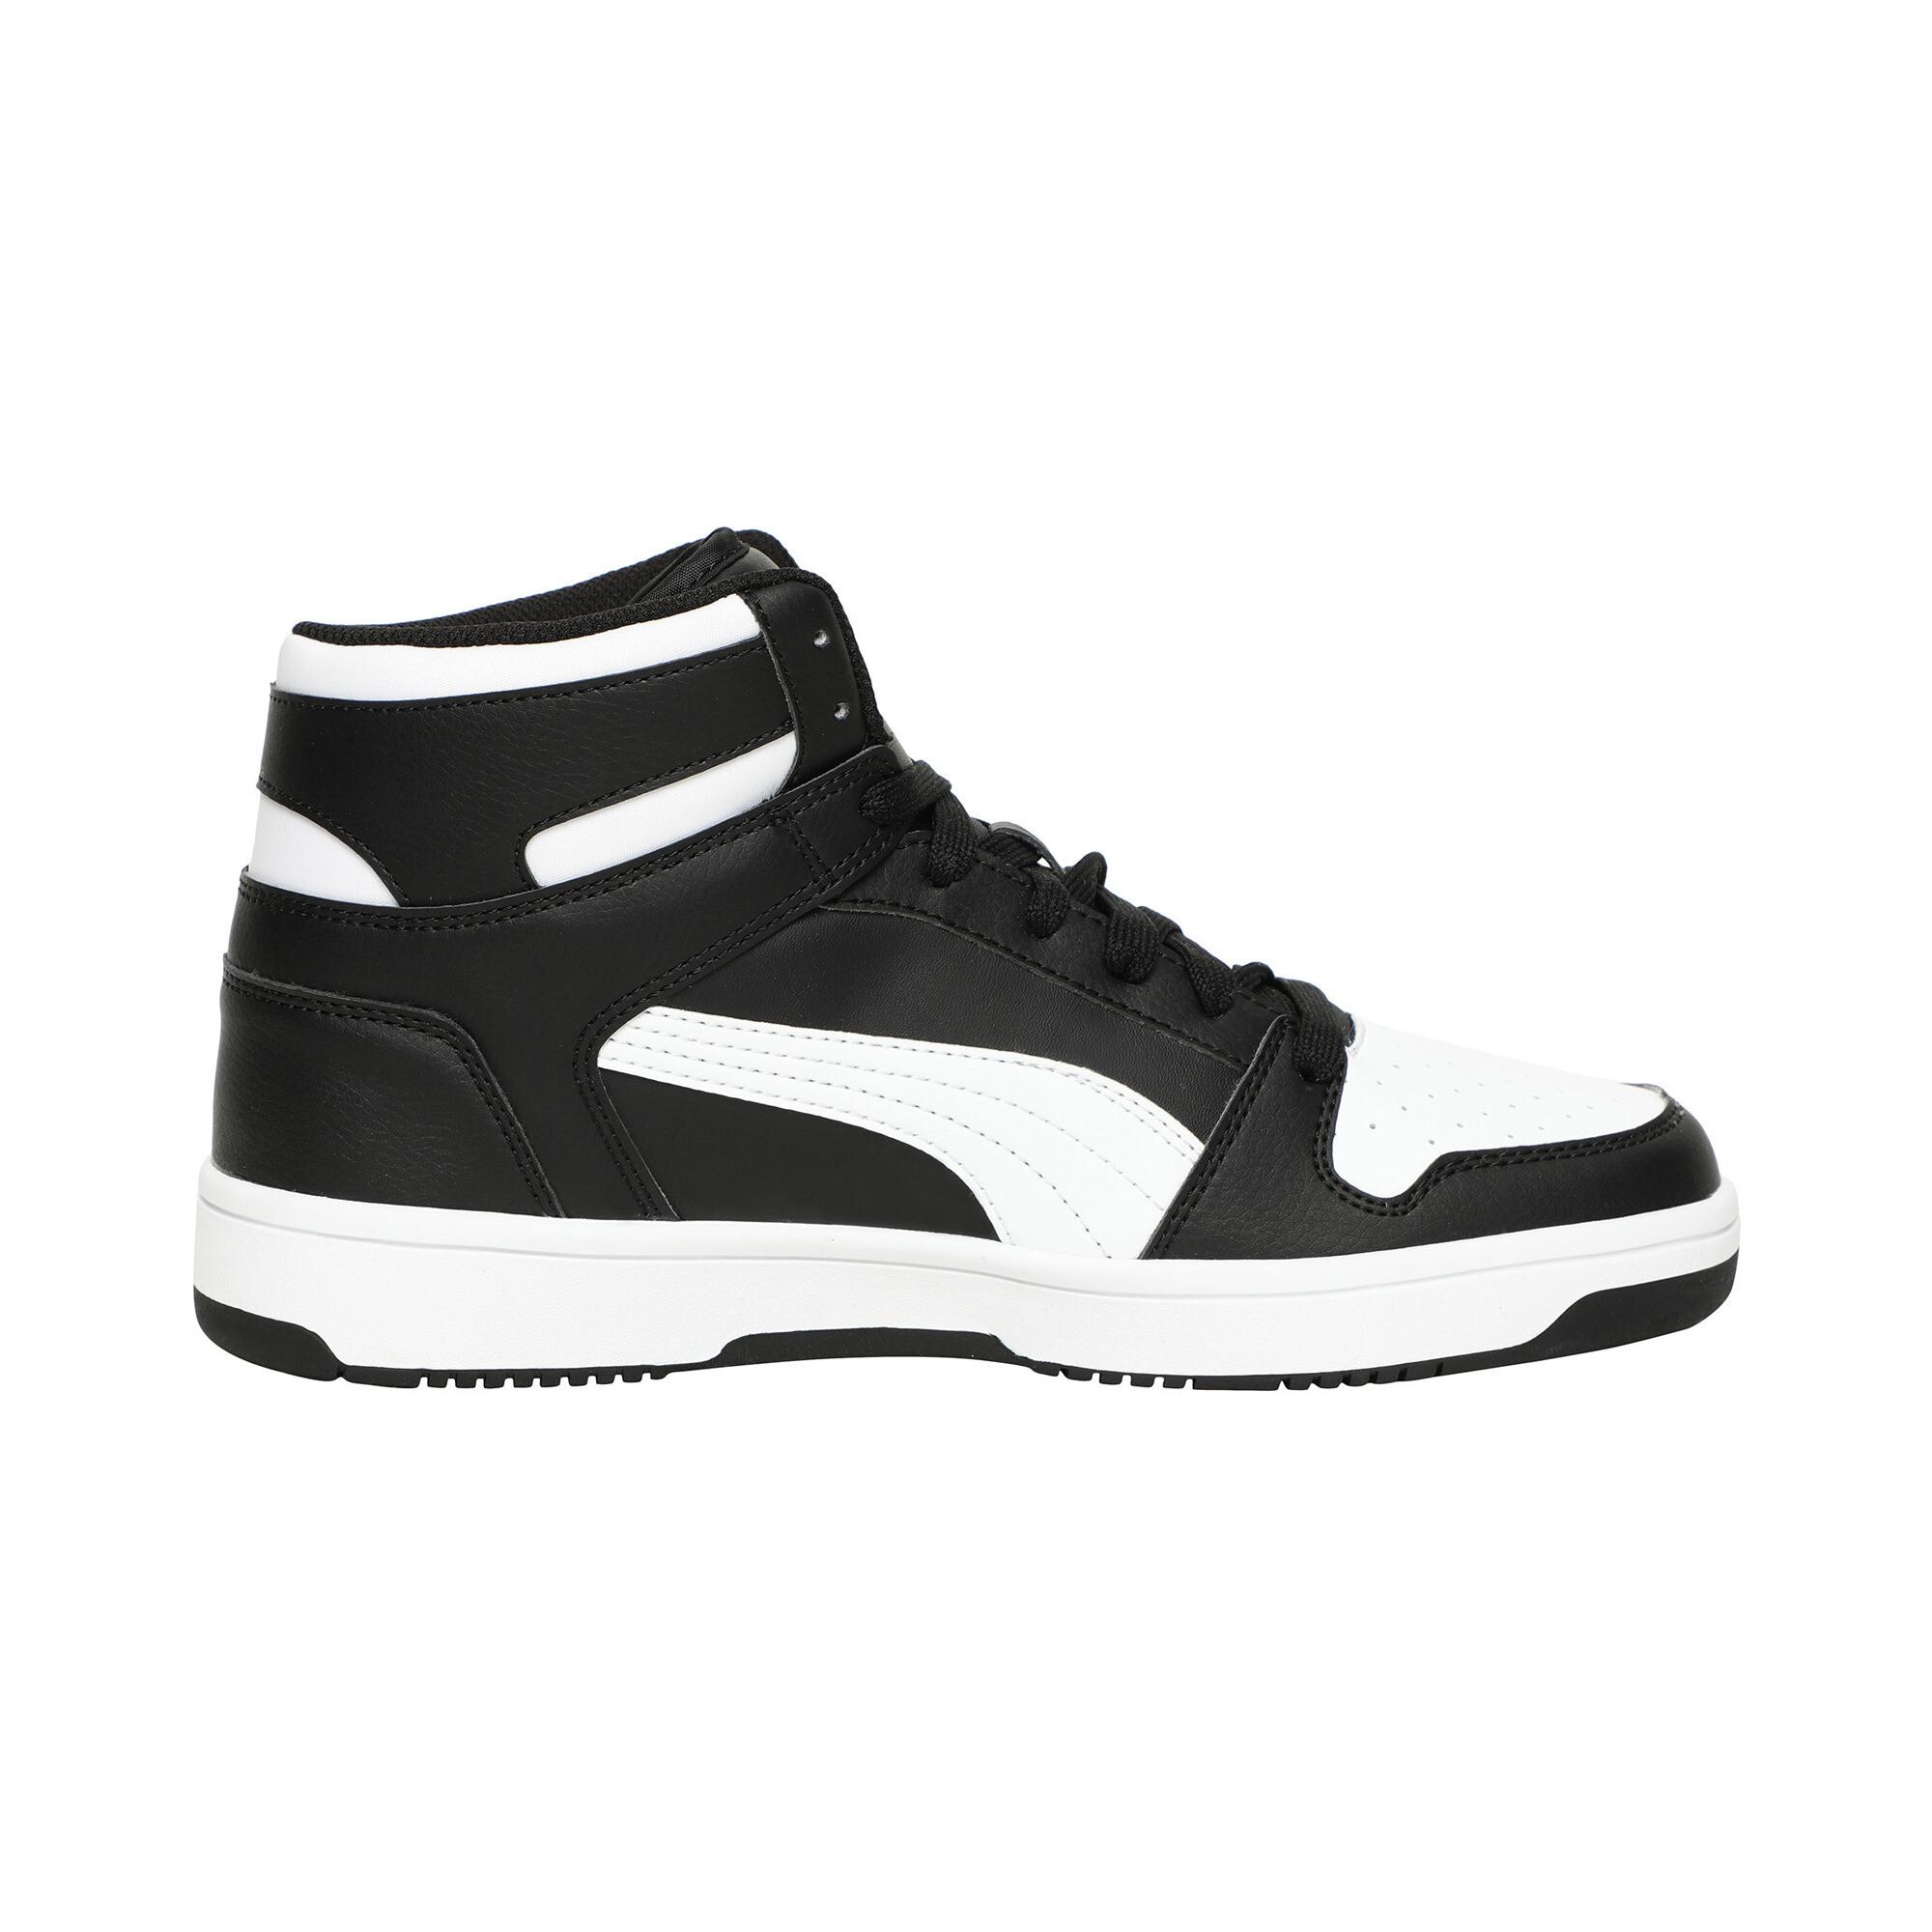 miniature 11 - Puma Men's Rebound LayUp Sneakers